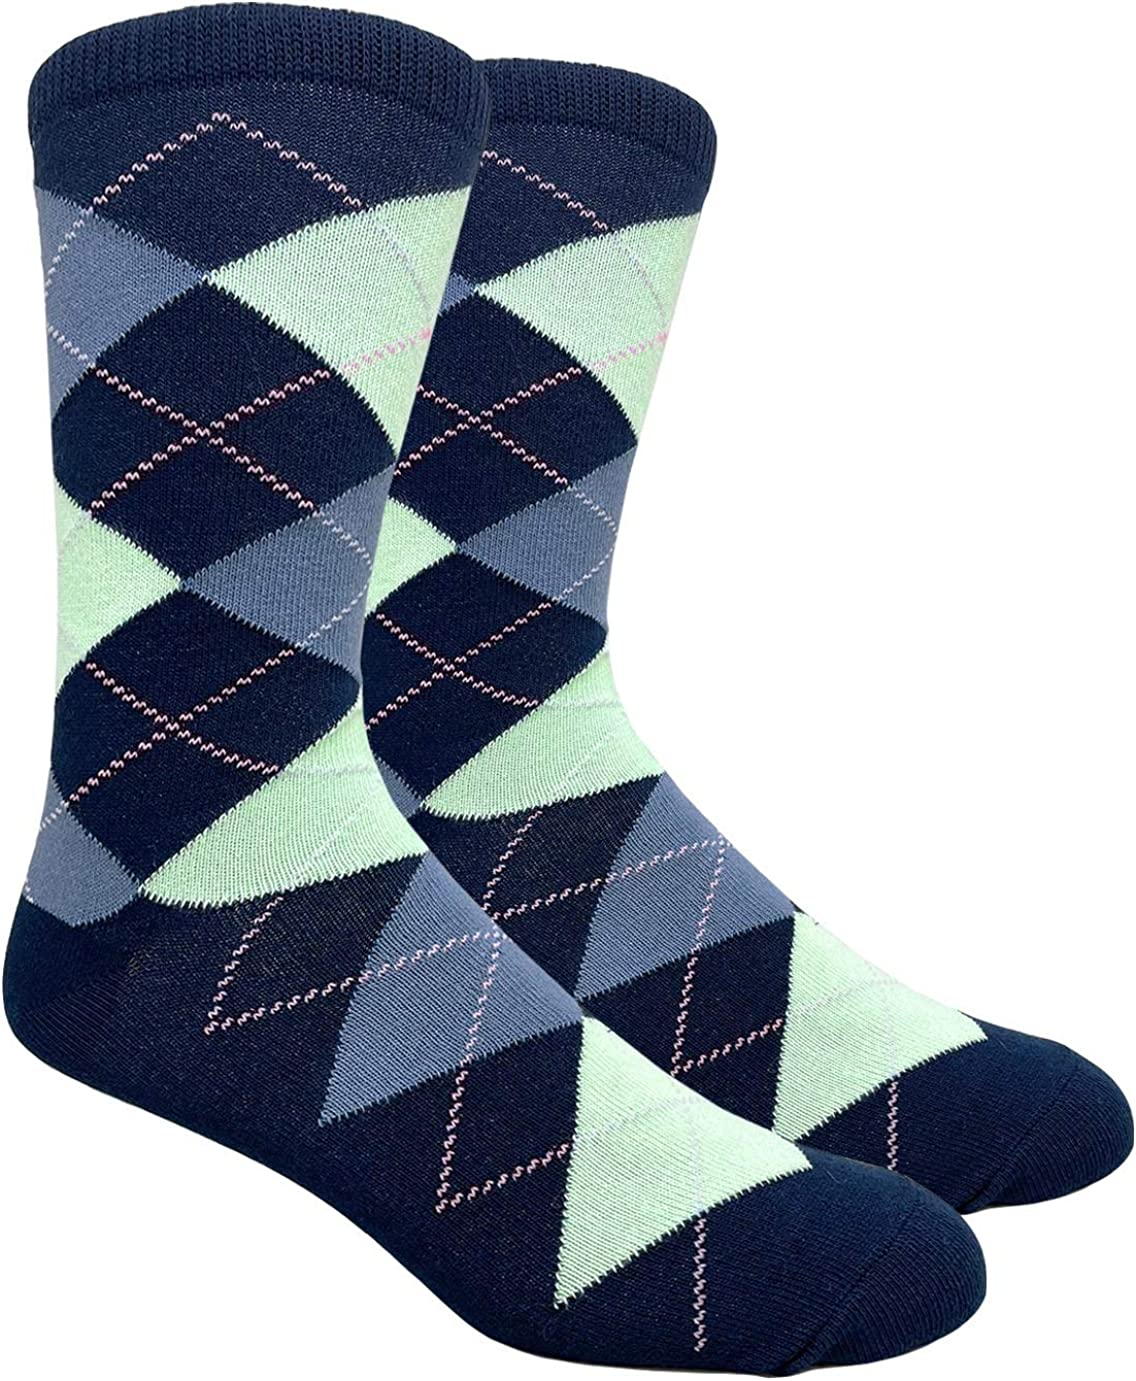 Urban-Peacock Men's Dress Groomsmen Socks Time sale Mul Various Easy-to-use Patterns -